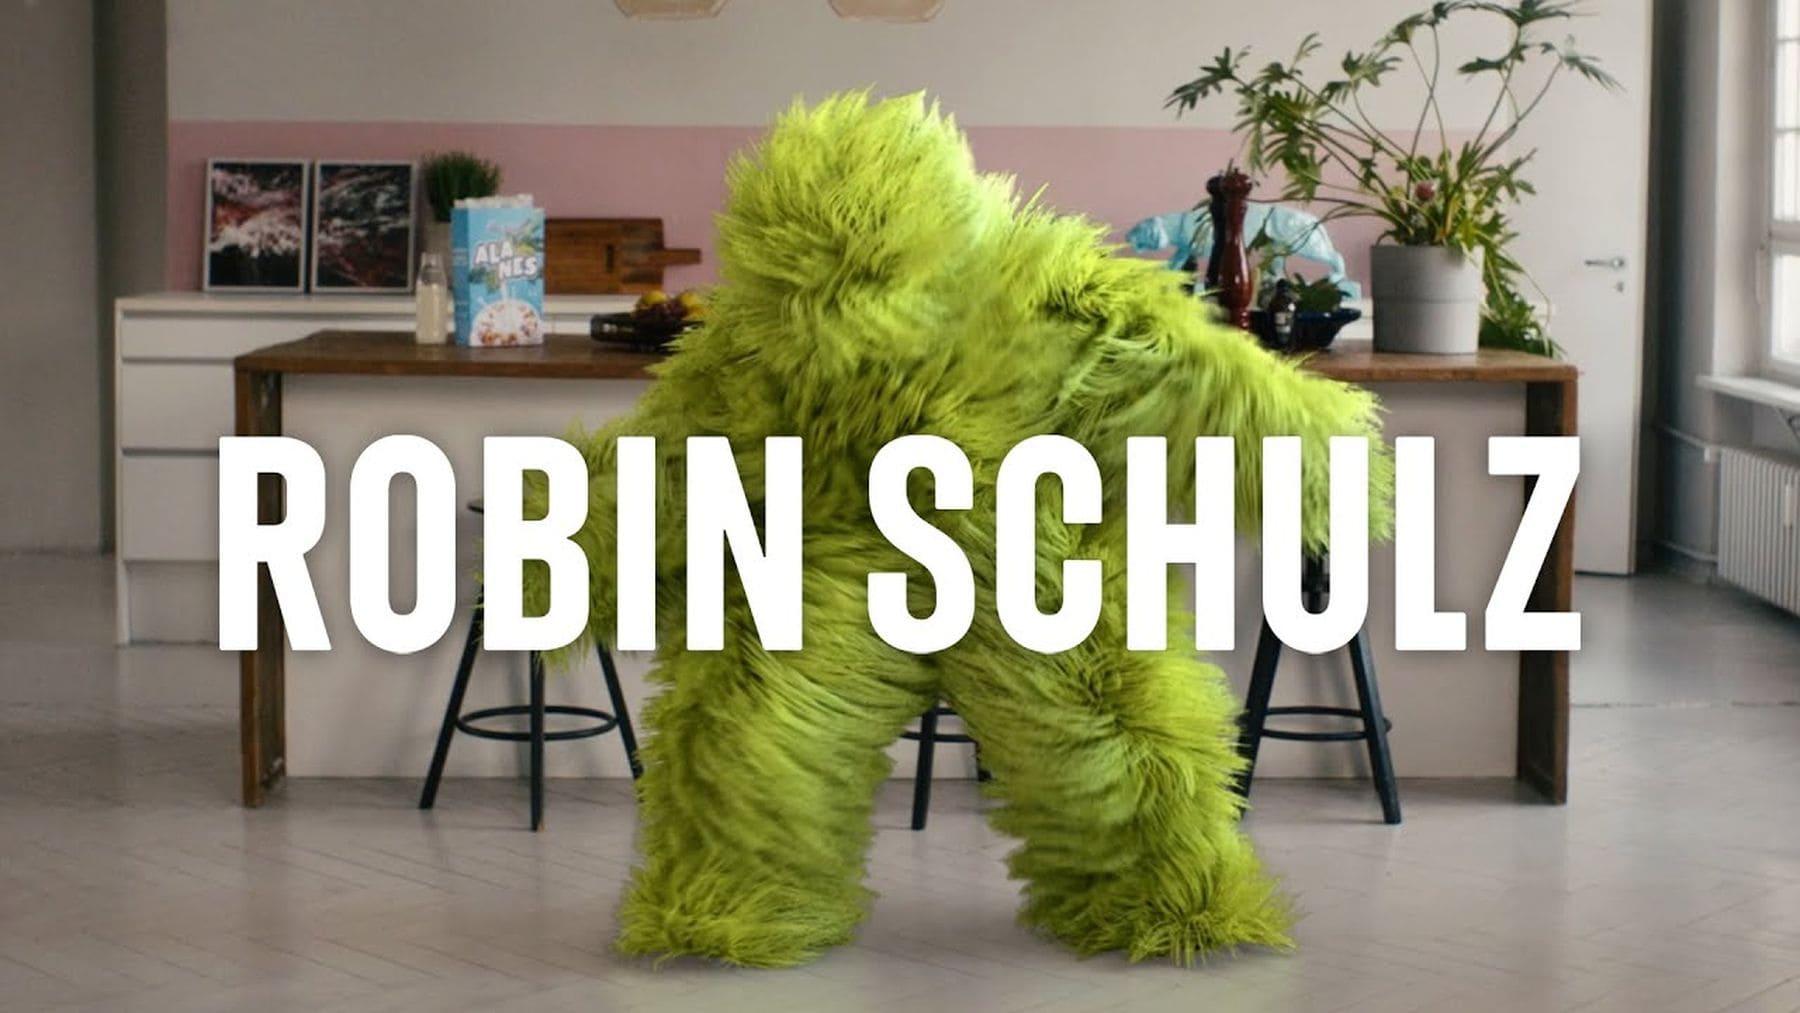 Robin Schulz & Wes - Alane | Musik | Was is hier eigentlich los?